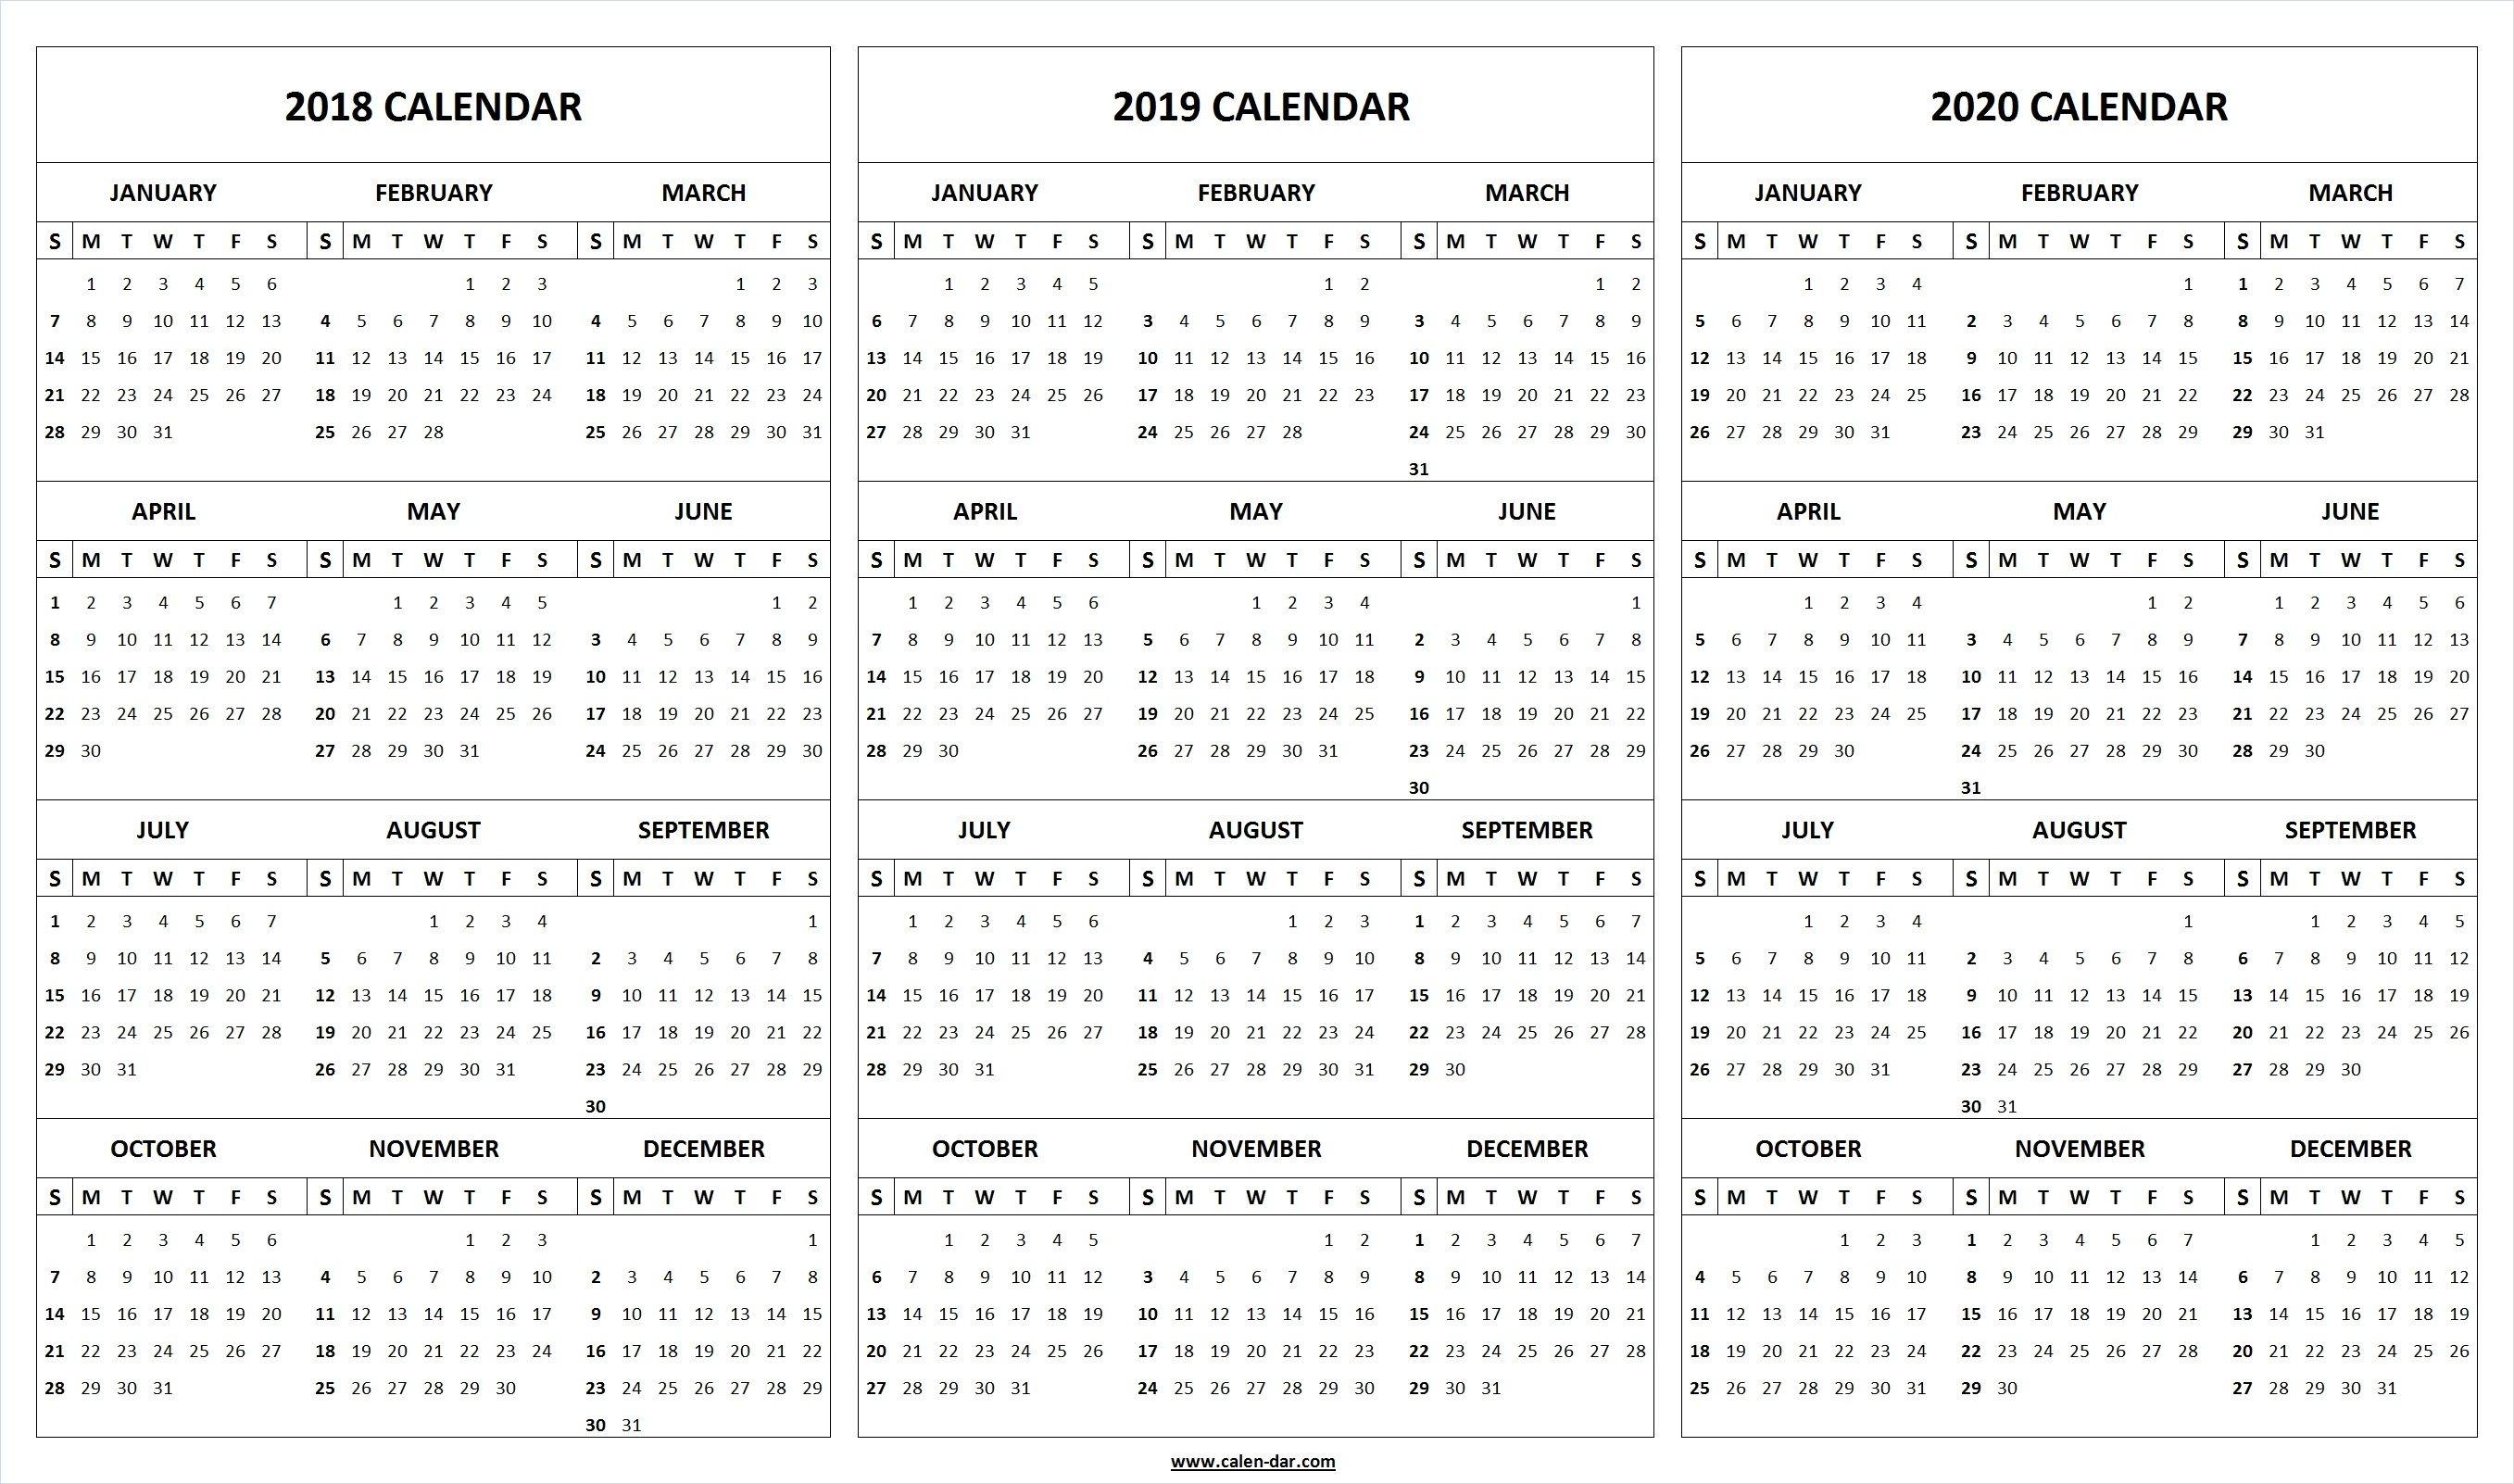 Print Blank 2018 2019 2020 Calendar Template   Organize!   Printable with regard to Year Long Calendar 2019- 2020 Printable